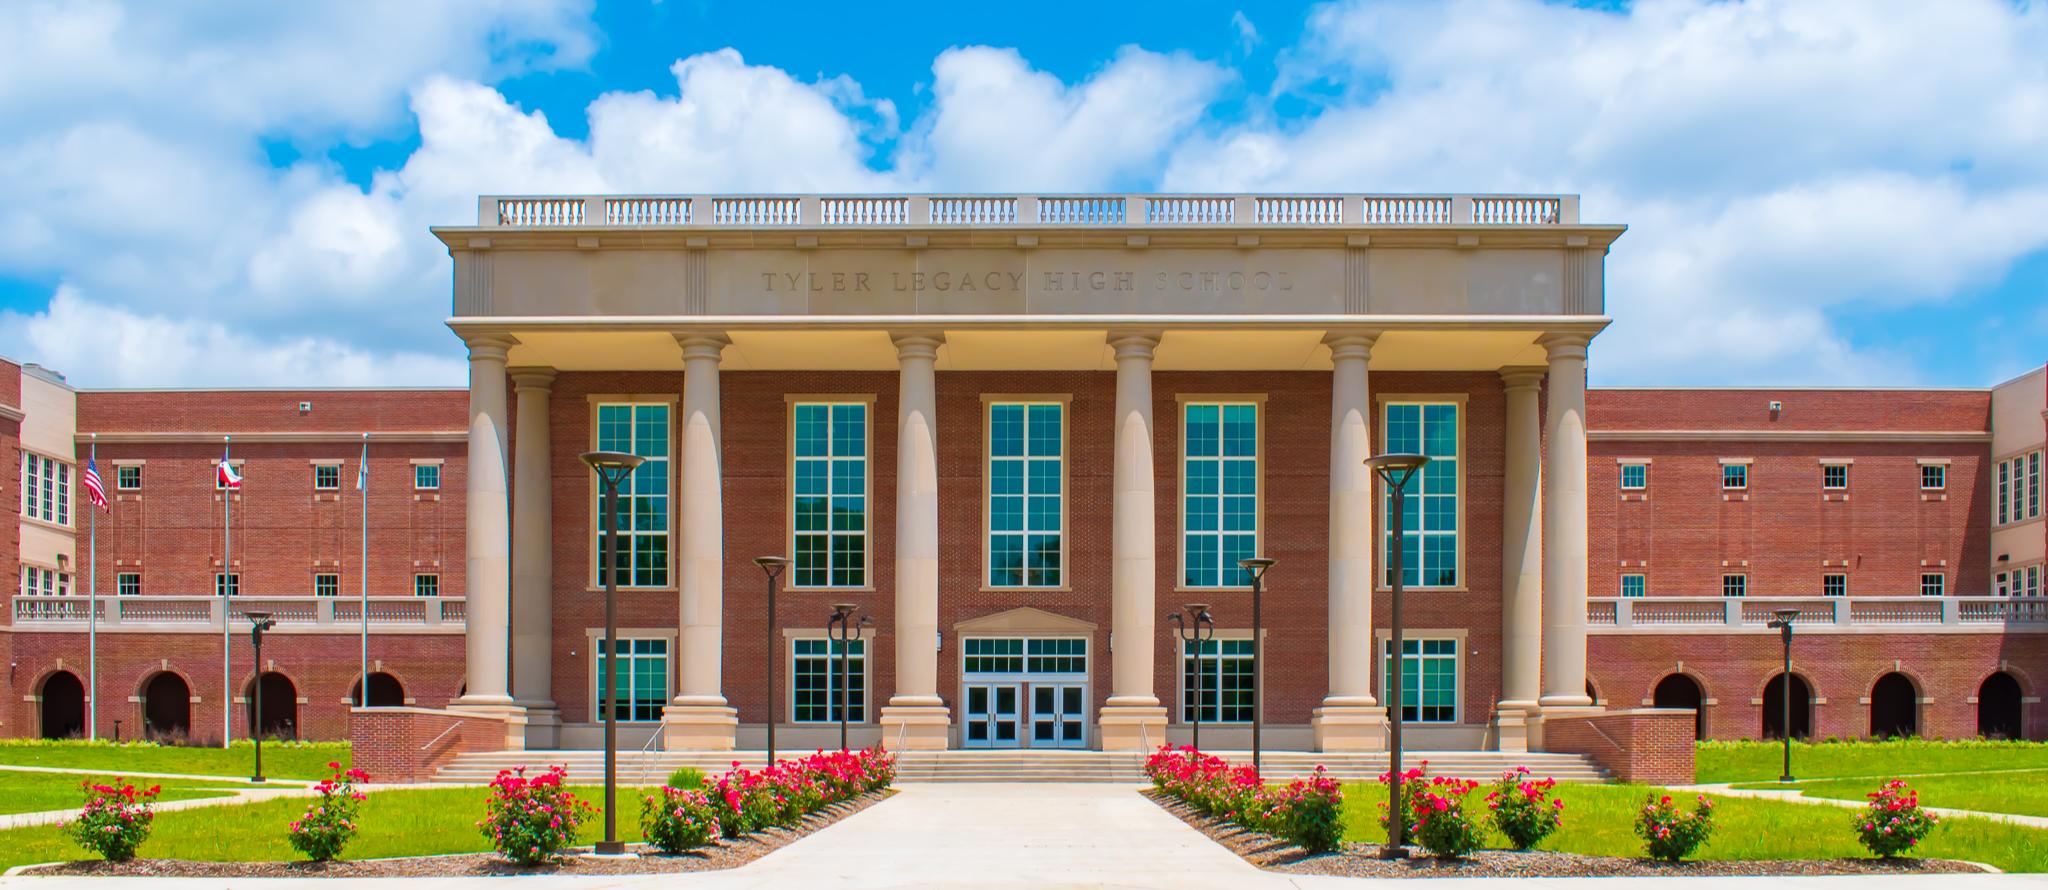 Entrance of Tyler Legacy High School